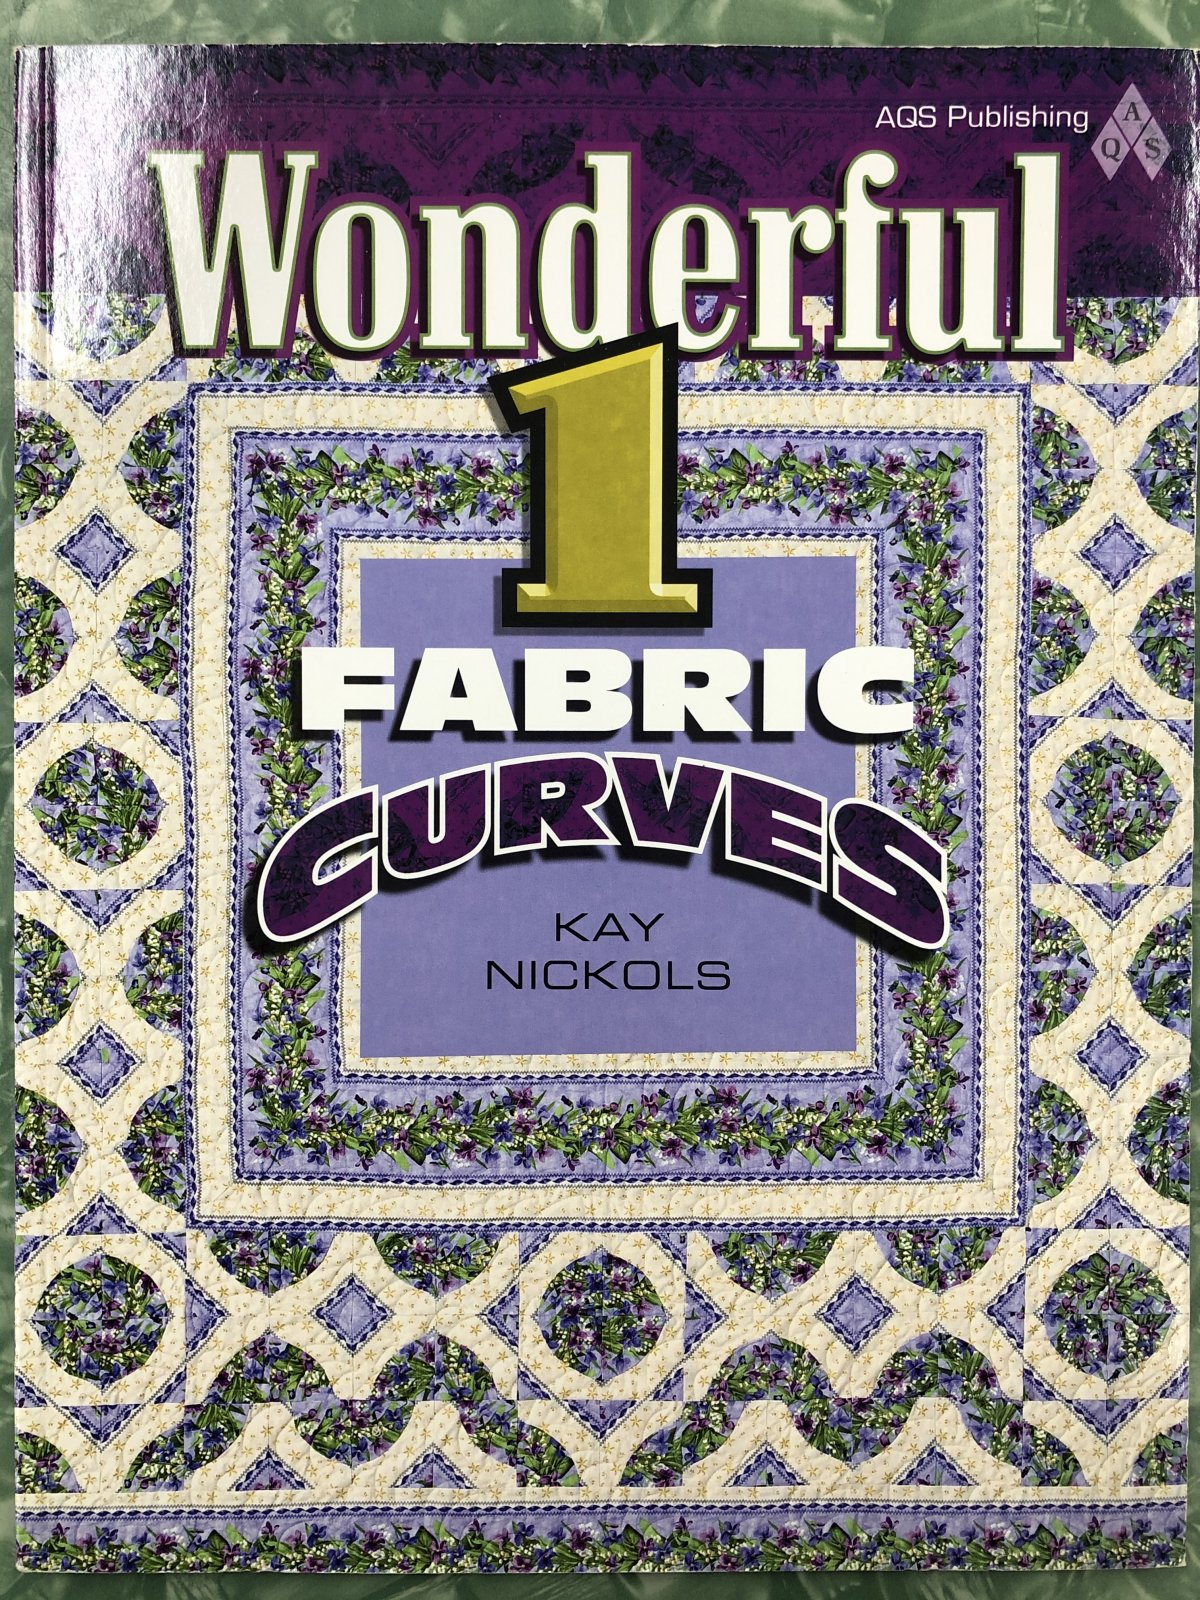 Wonderful 1: Fabric Curves